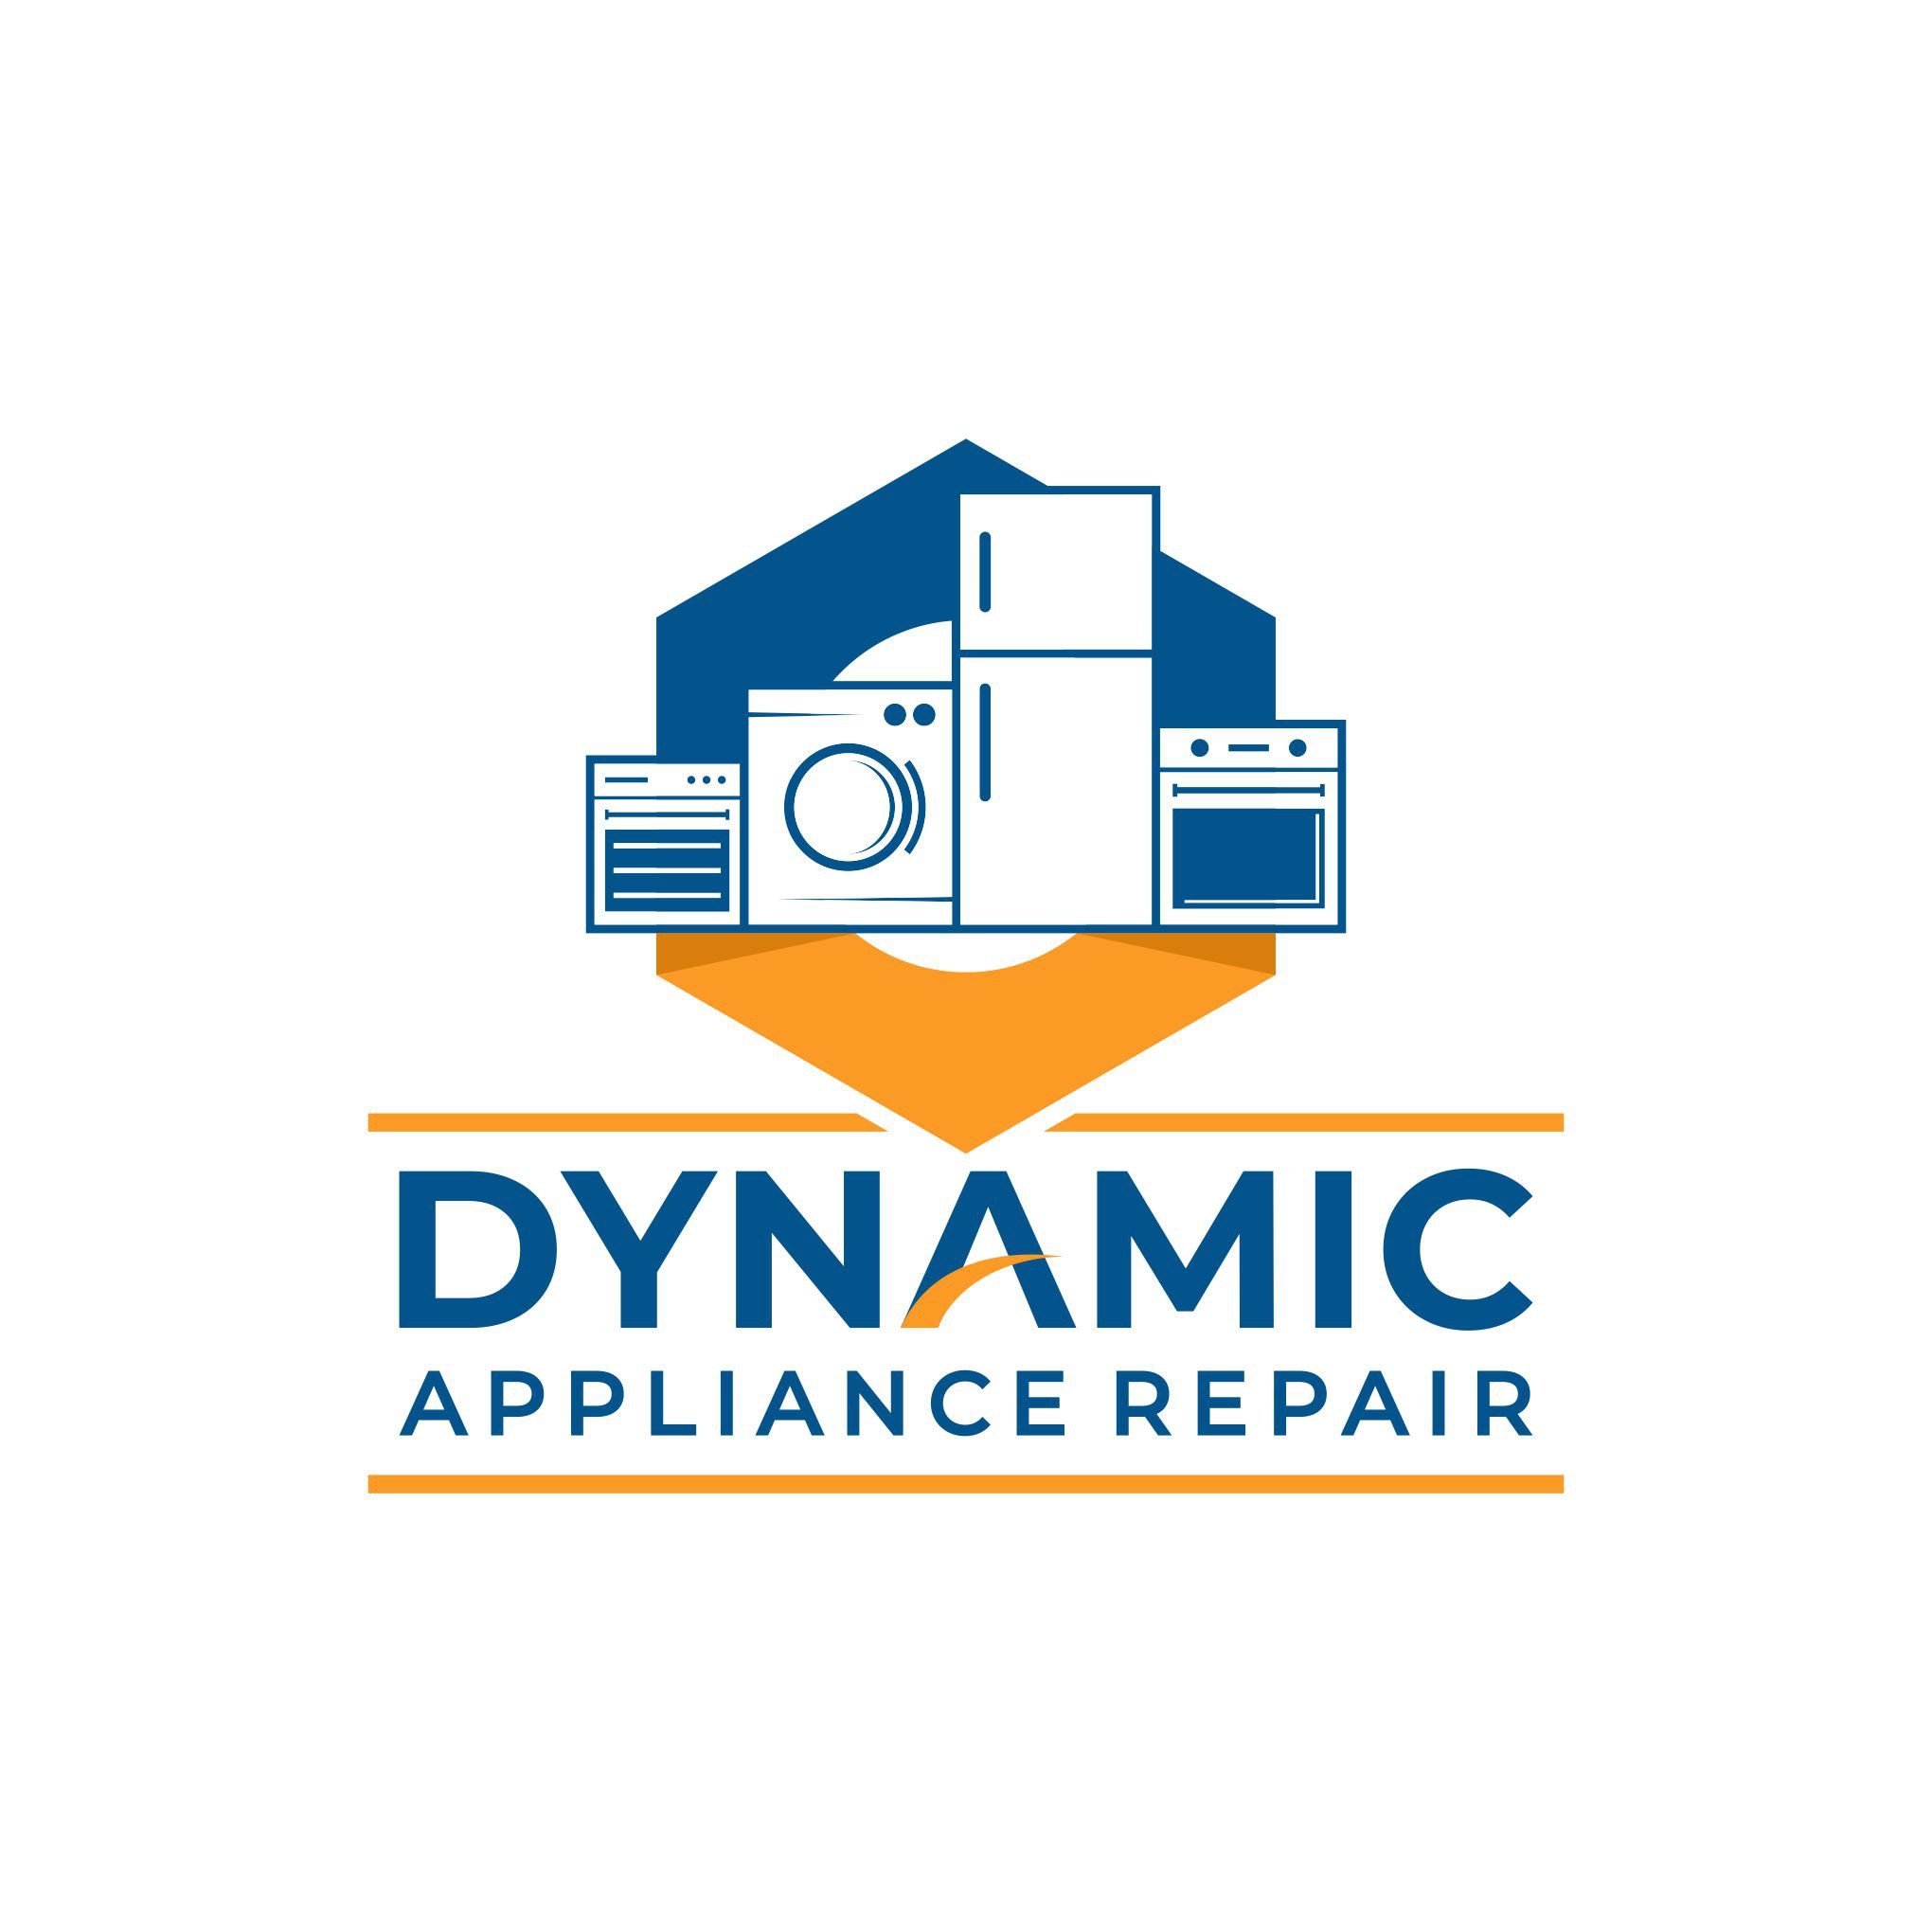 Need a dynamic design for Dynamic Appliance Repair